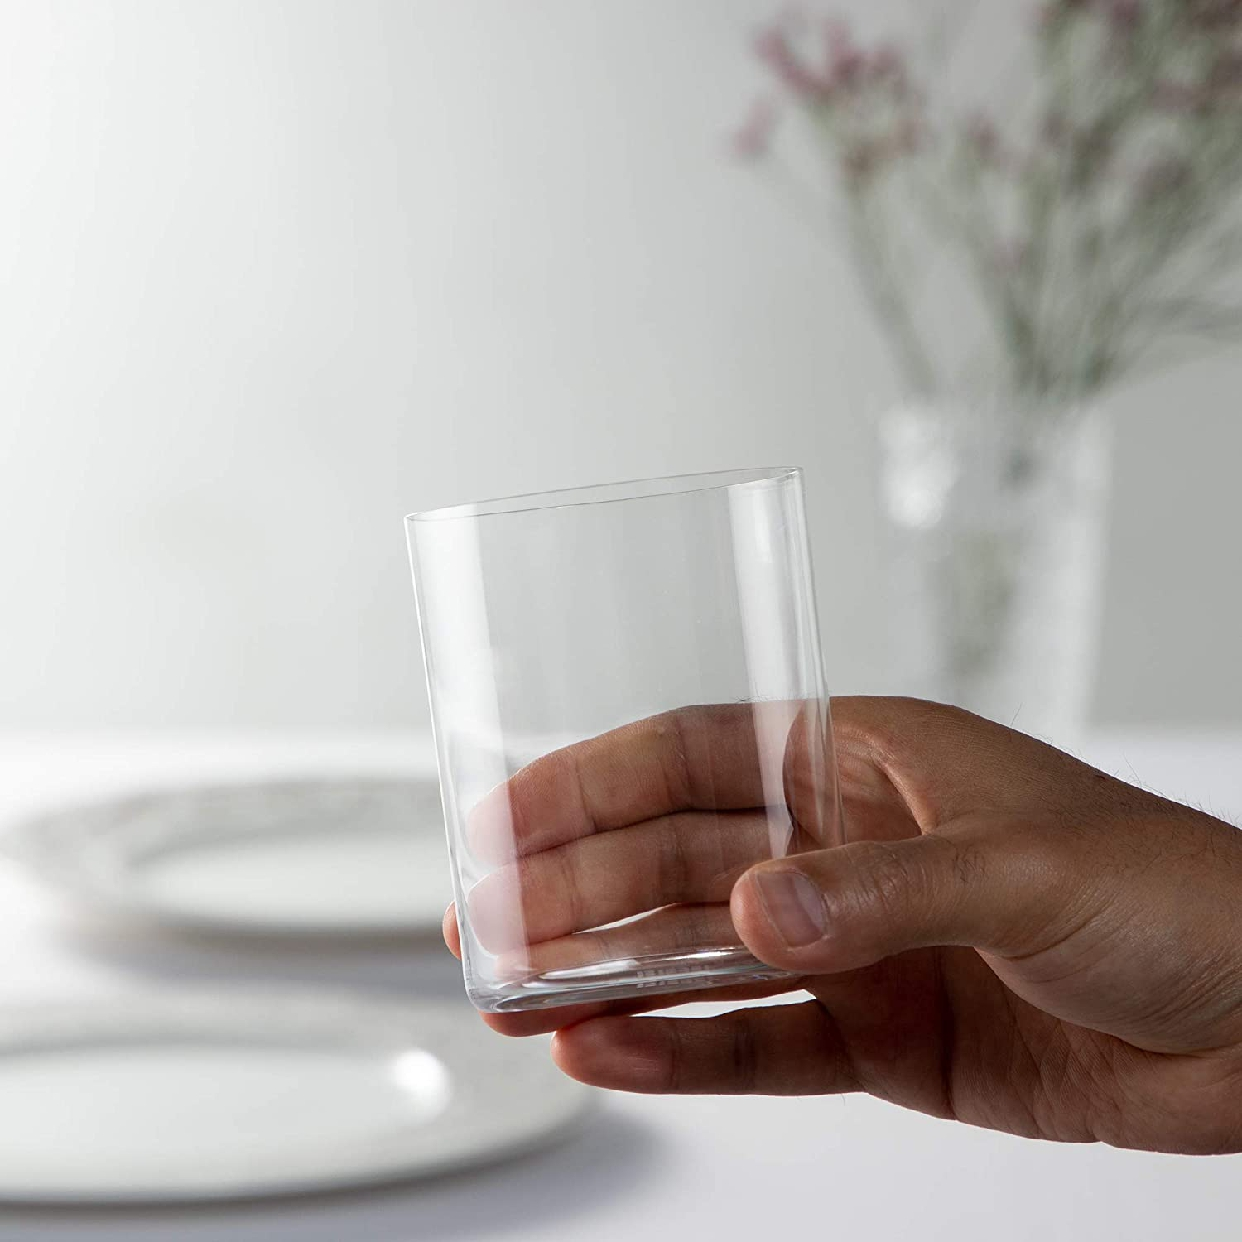 RIEDEL(リーデル) <H2O> ウイスキー(2個入)430 ml 0414/02の商品画像3